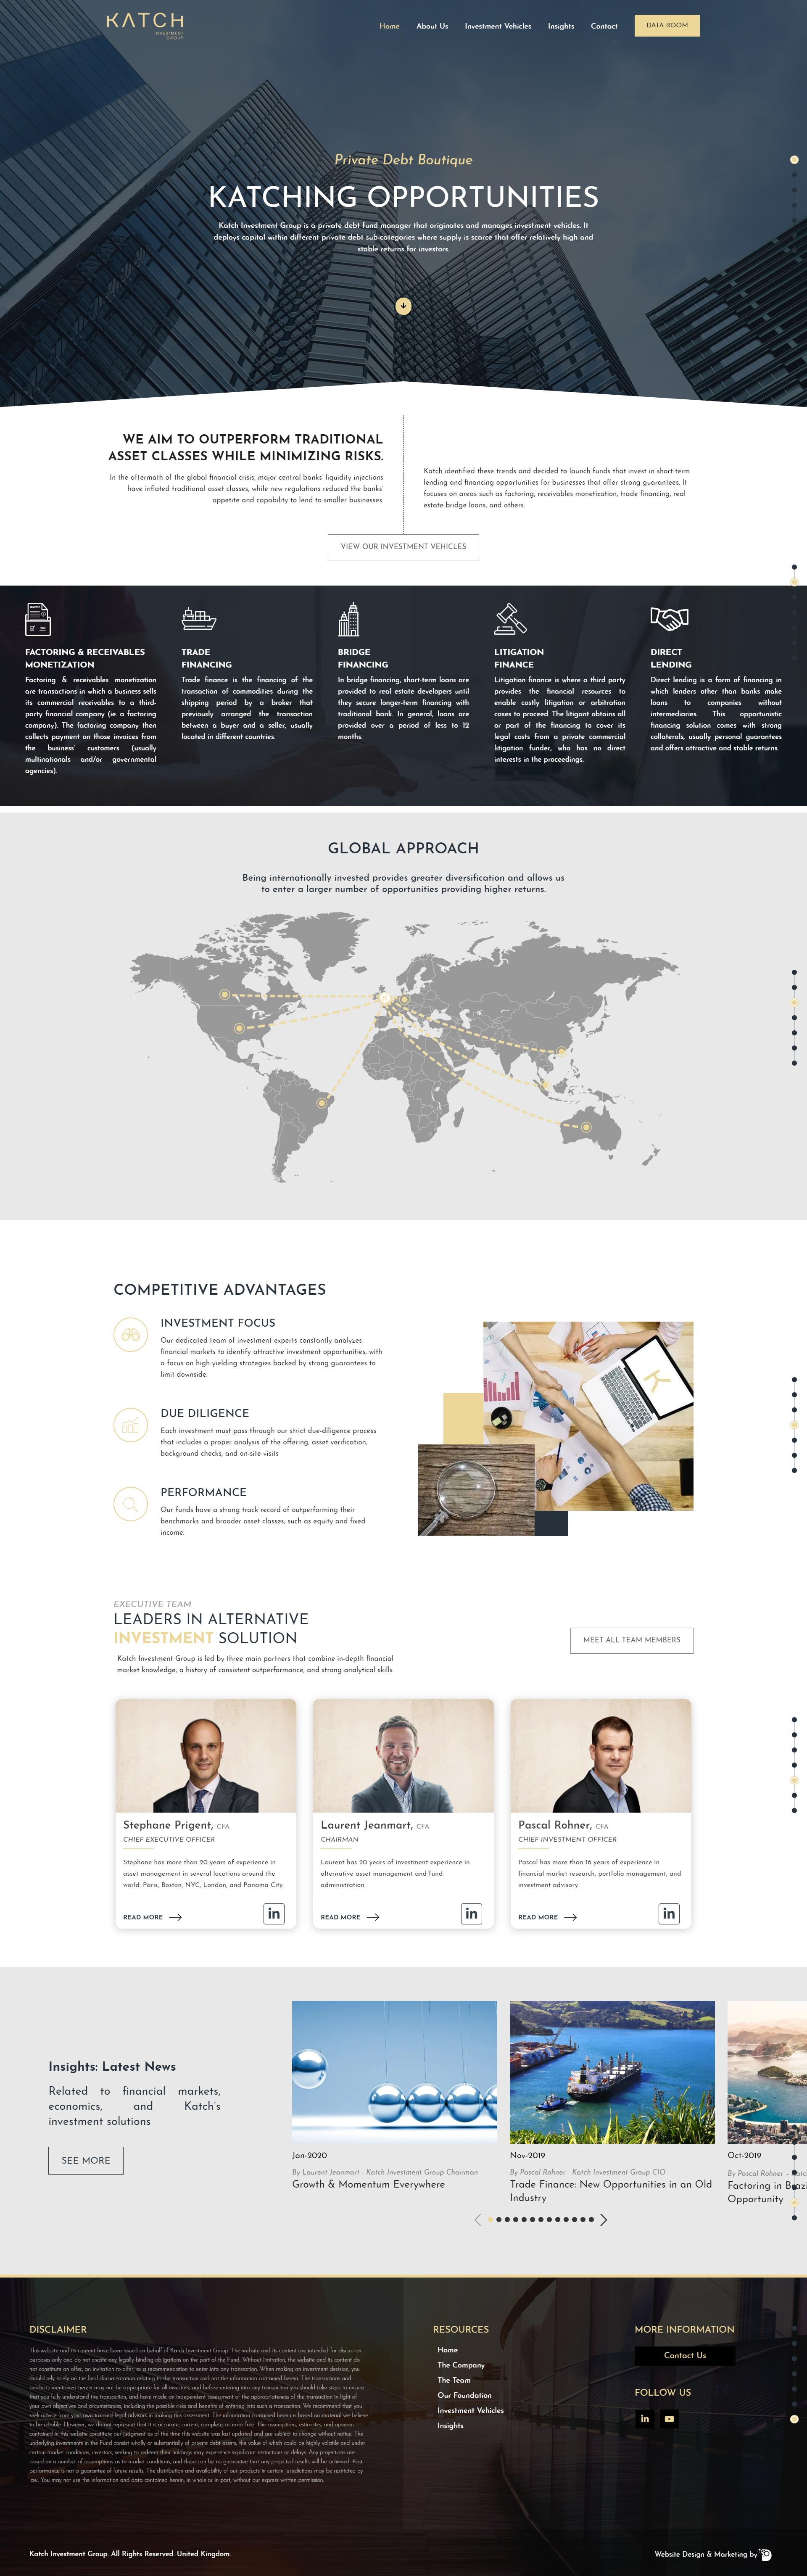 katch-new-website